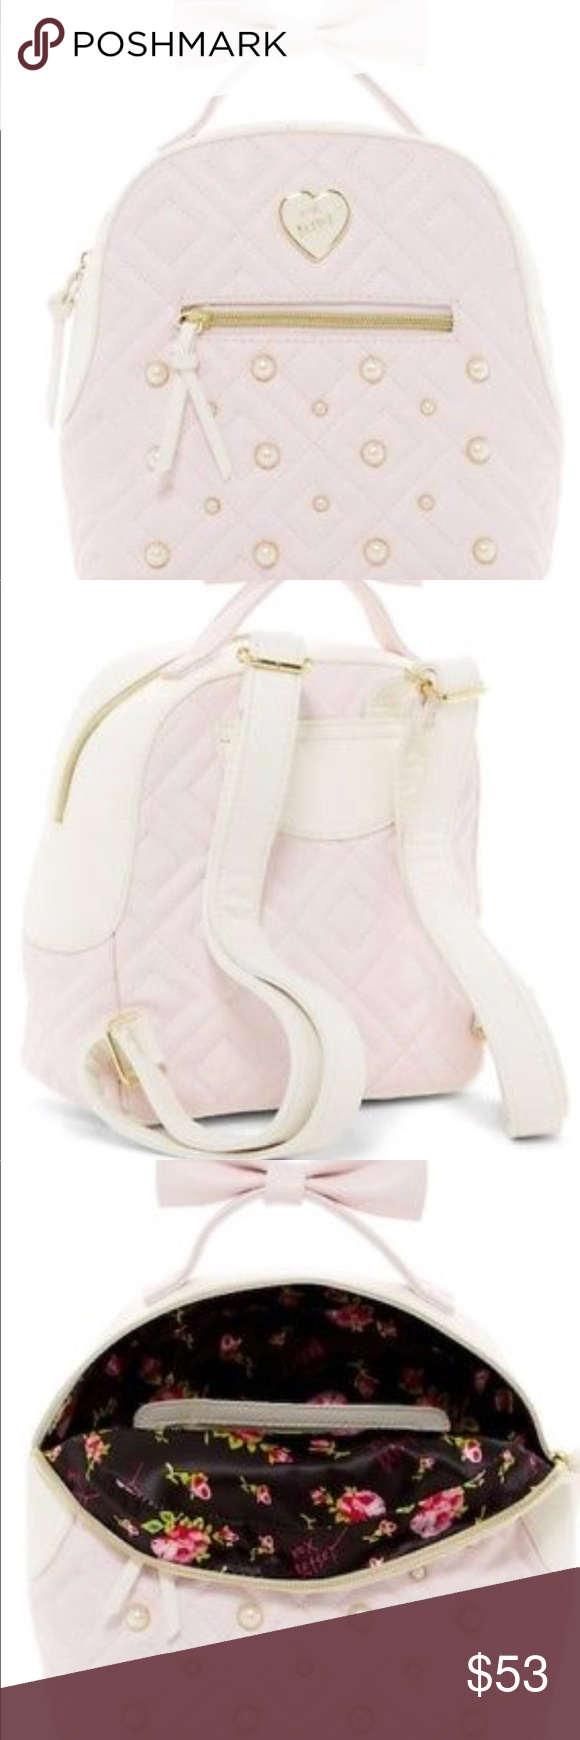 230baa5aea84 Betsey Johnson mini backpack - Betsey Johnson Chevron Heart quilted medium  backpack - Color   blush